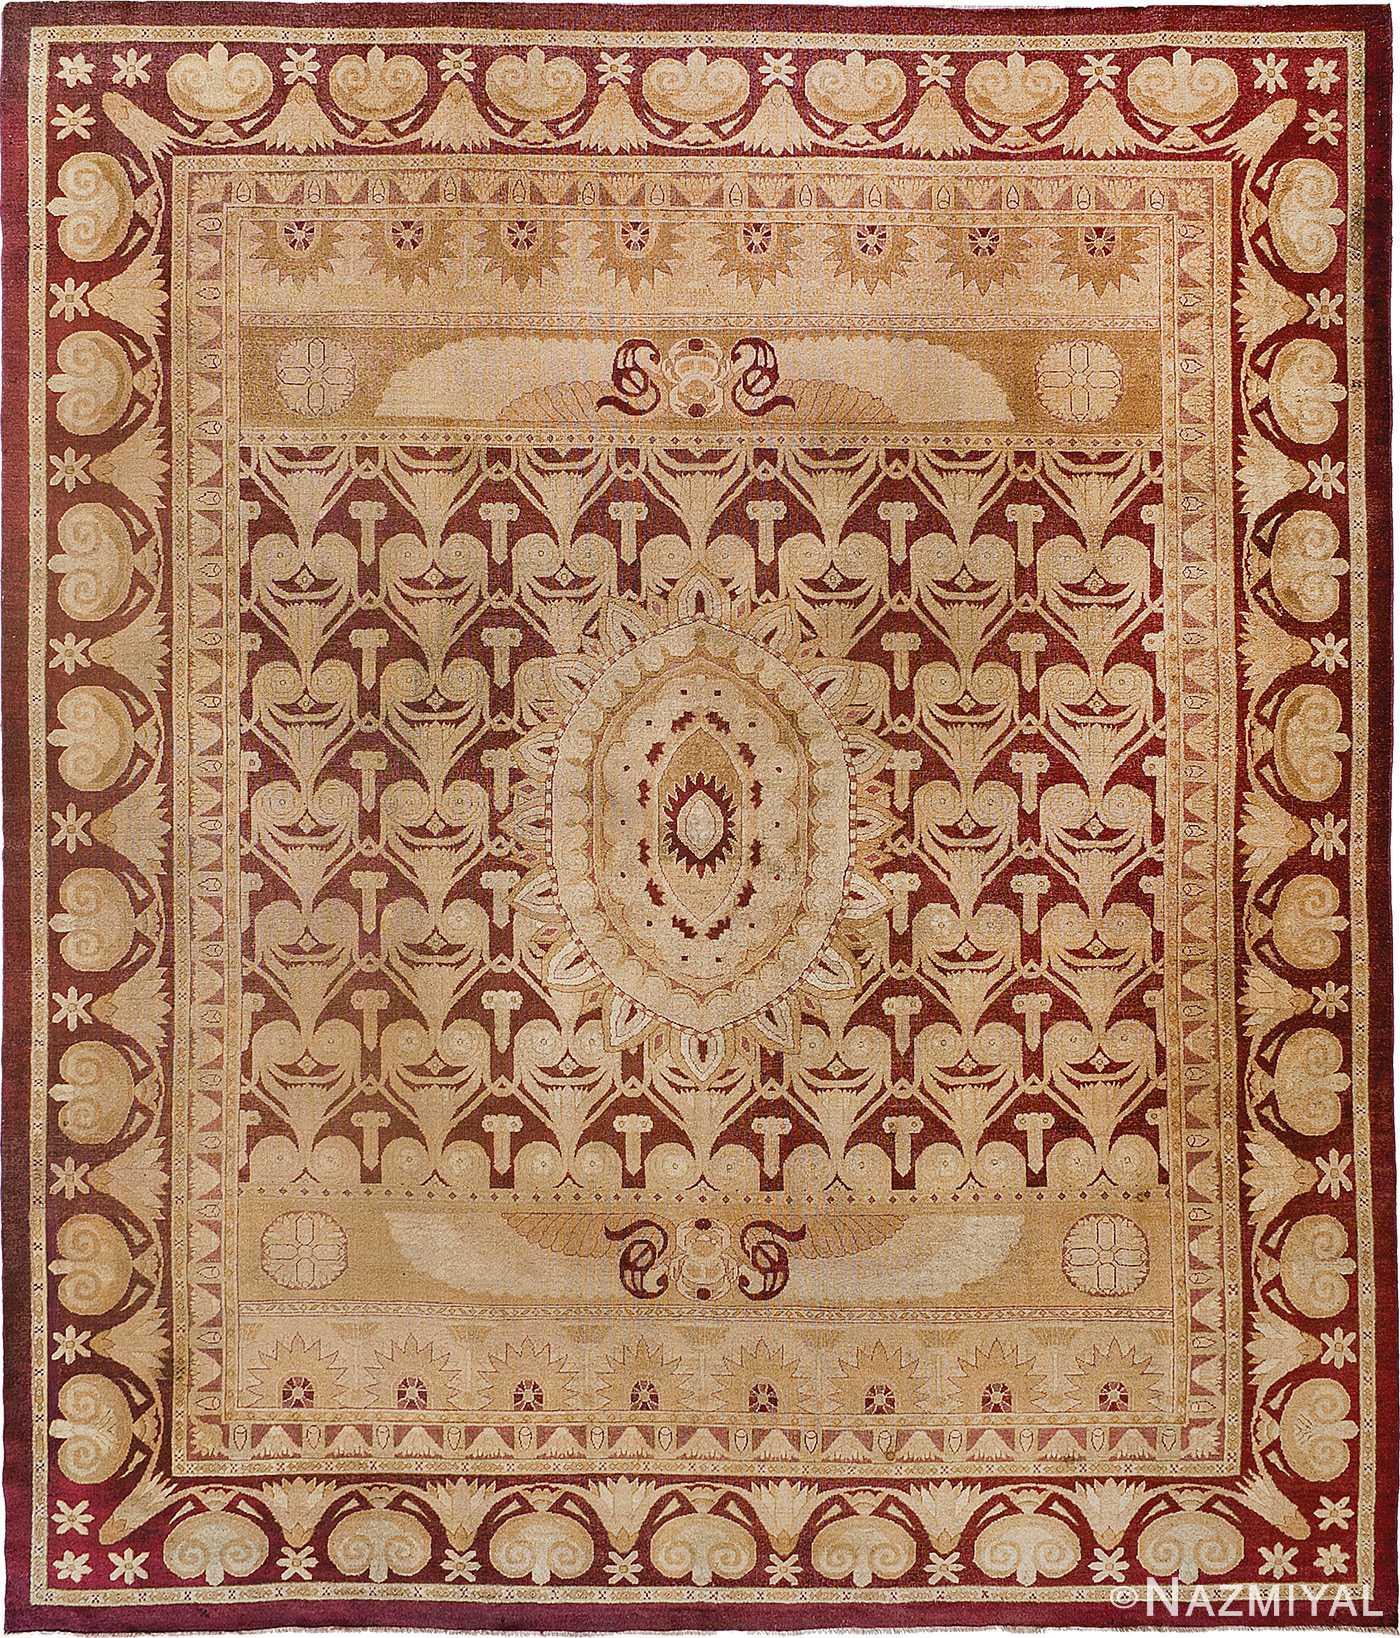 Amritsar Carpet 90028 Nazmiyal Antique Rugs